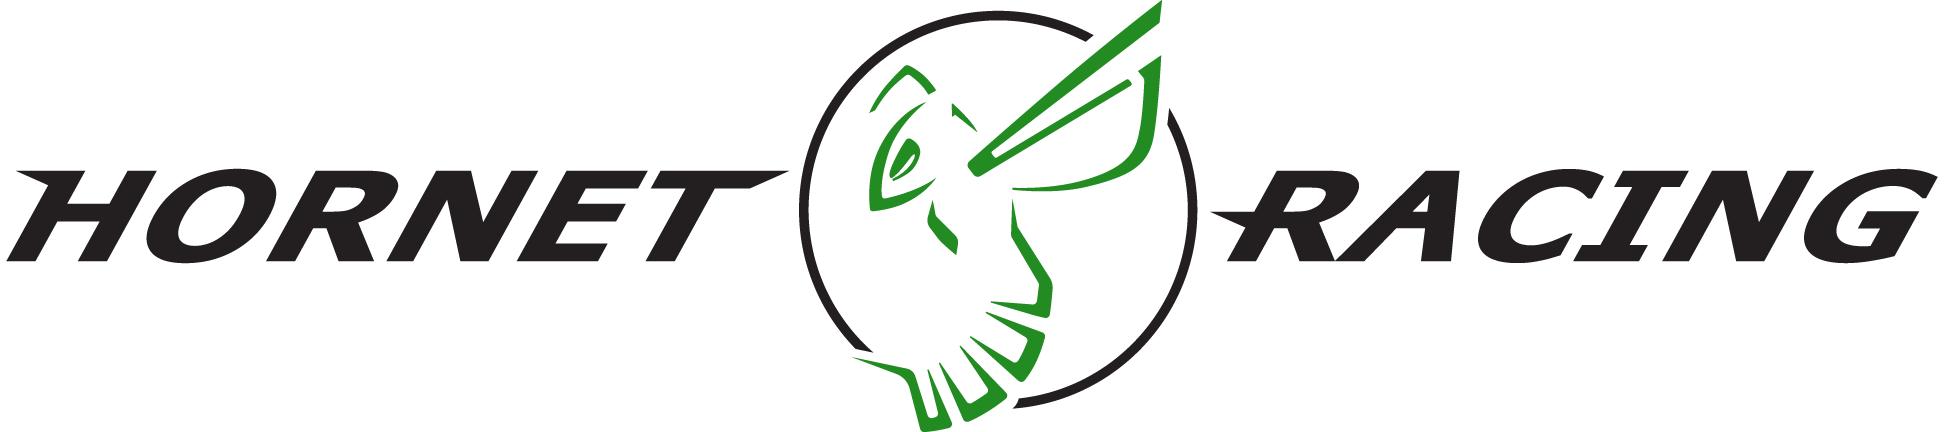 Hornet-Racing-2018-Logo-Final-Large.png